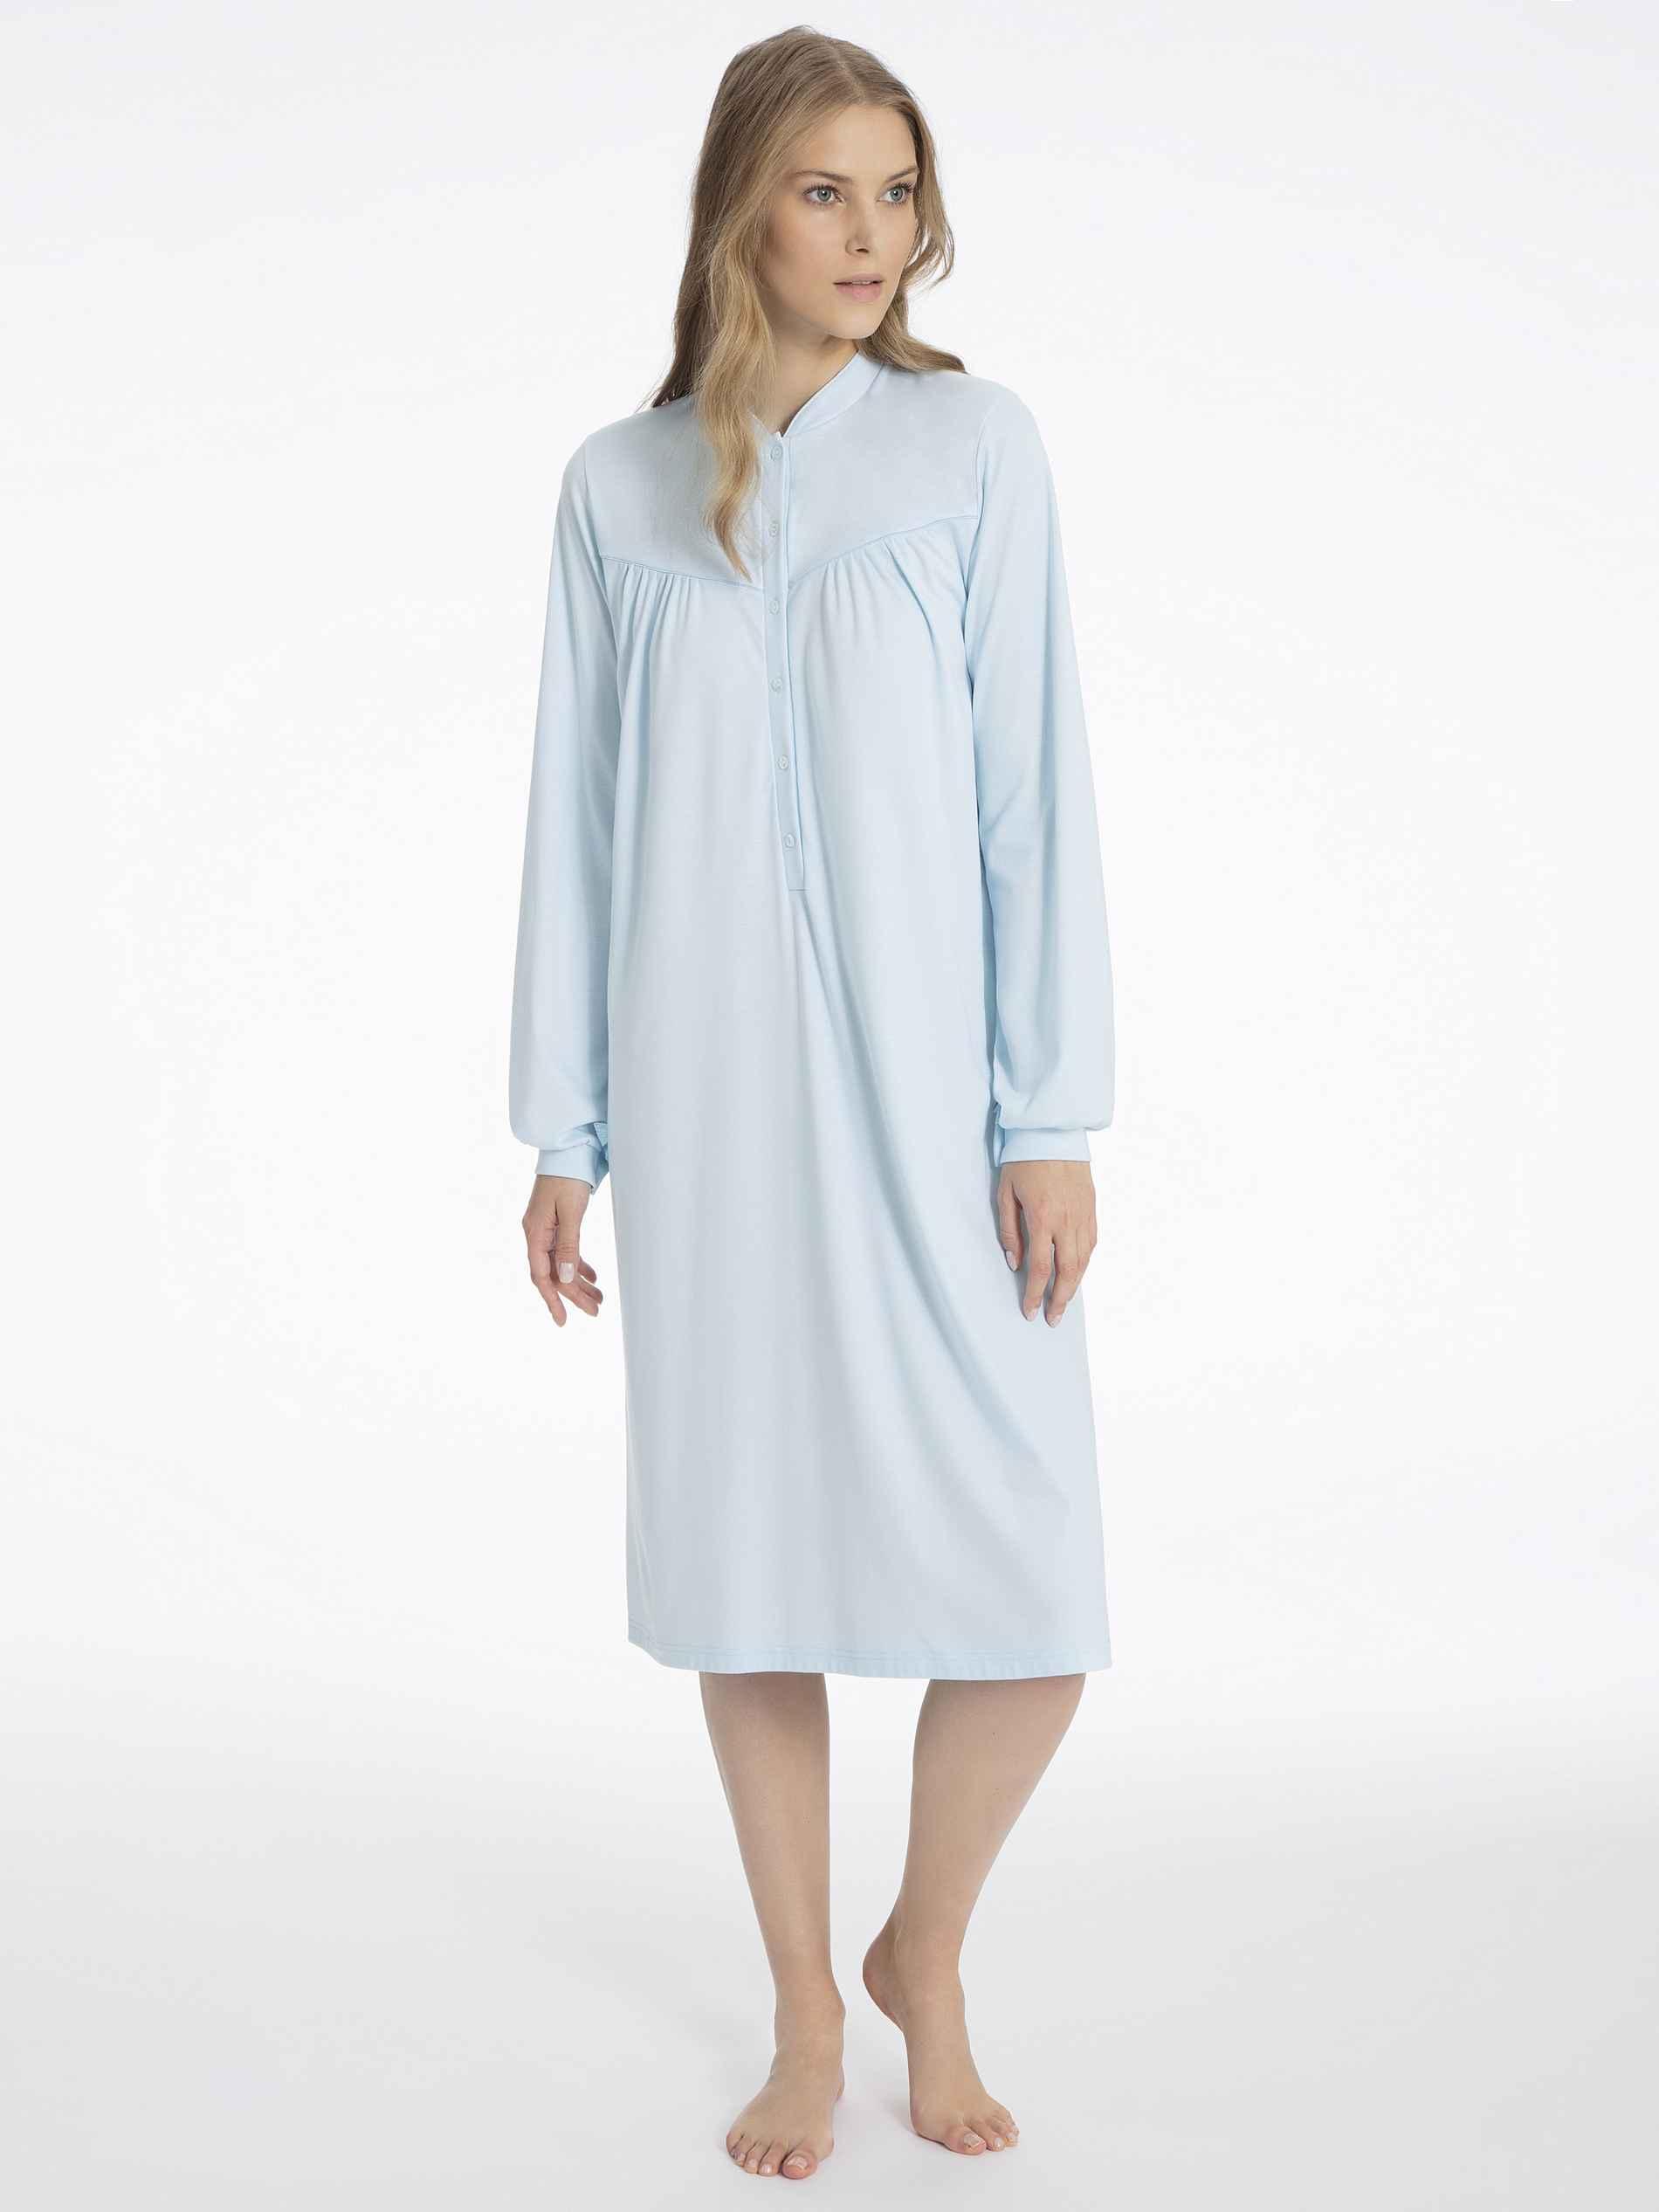 Damen CALIDA Soft Cotton Nightshirt blau | 07610441933893